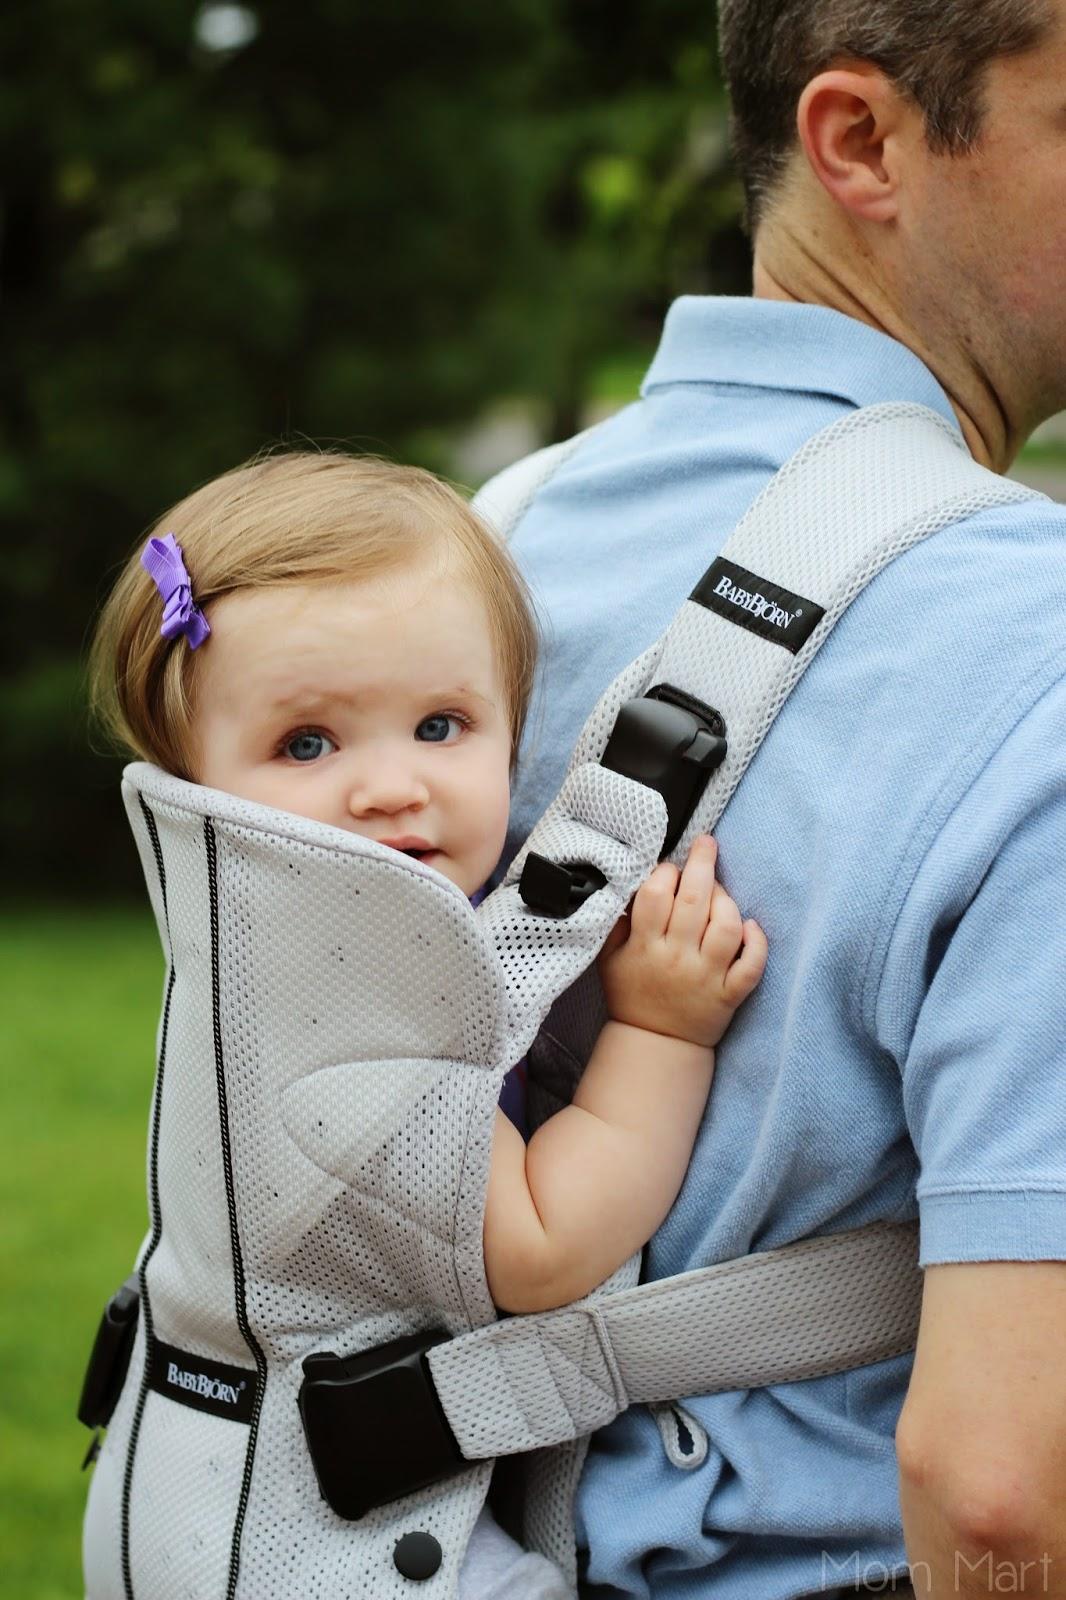 BABYBJÖRN Baby Carrier One in Silver Mesh #BabyWearing #BabyCarrierOne #OneIsAllYouNeed #Giveaway #wearallthebabies #babywearingdad